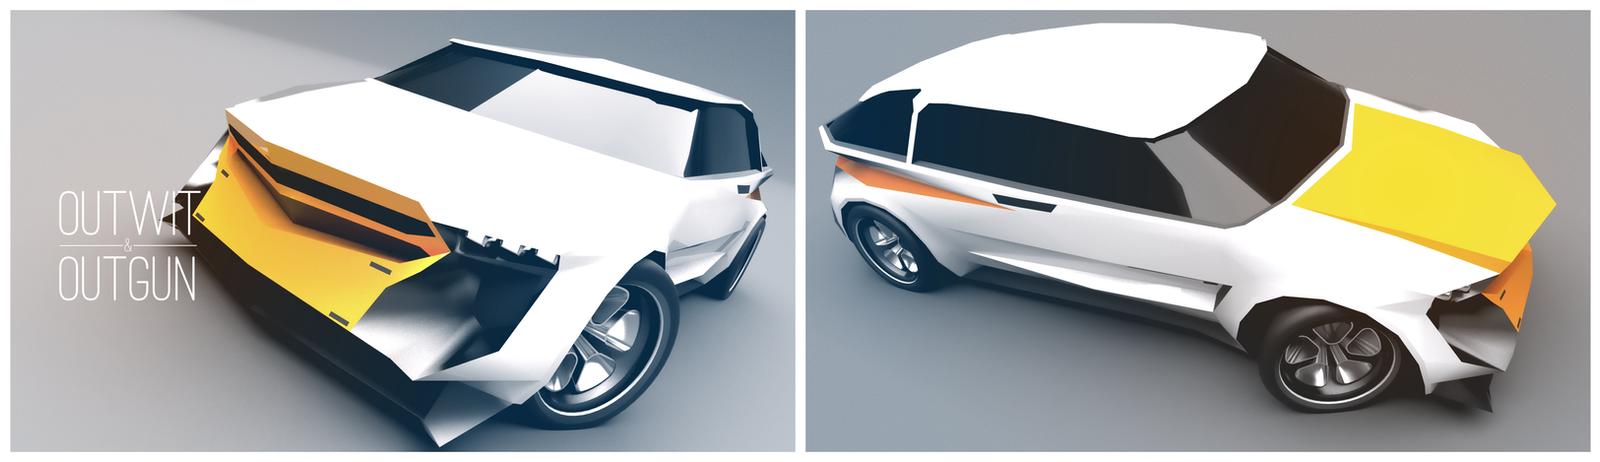 Hatch Sketch by Pixel-pencil